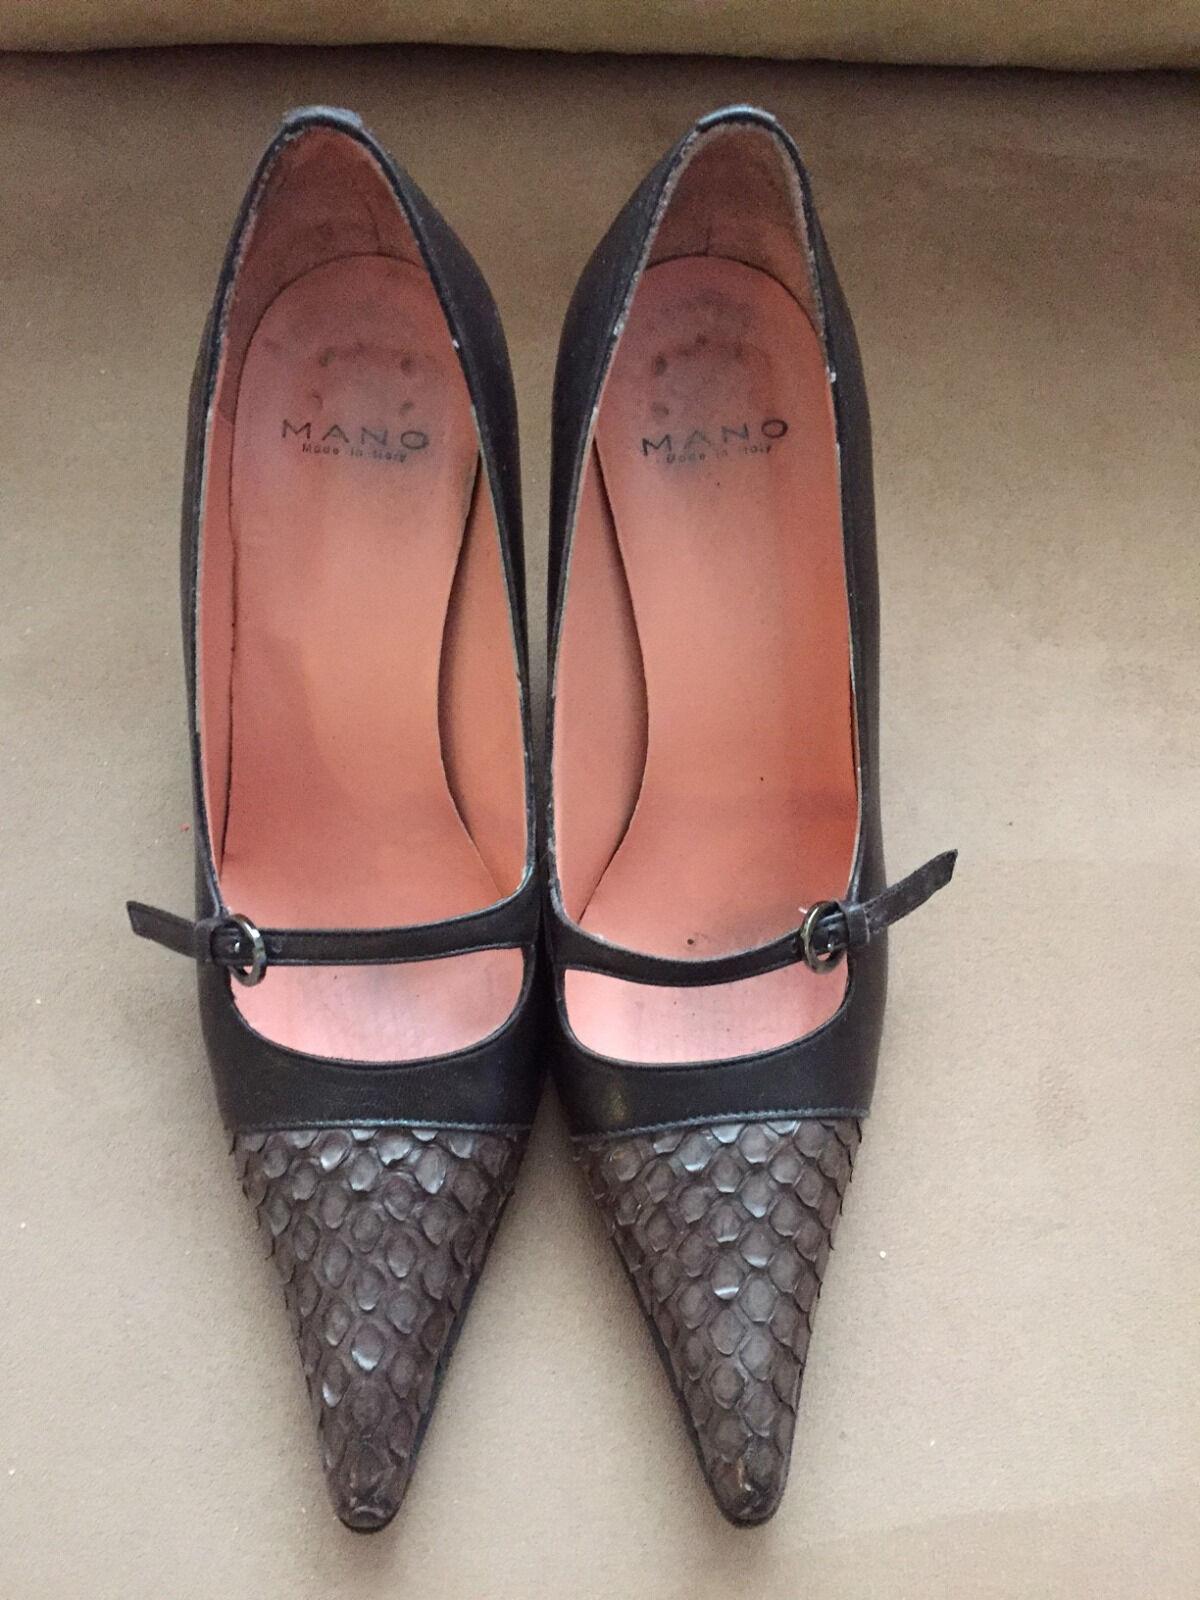 Mano 100% Italian Leather shoes